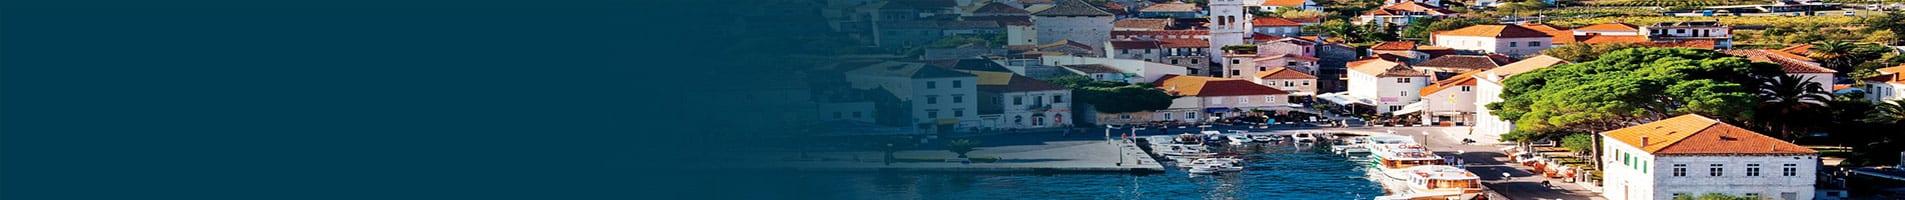 croatia country hub header